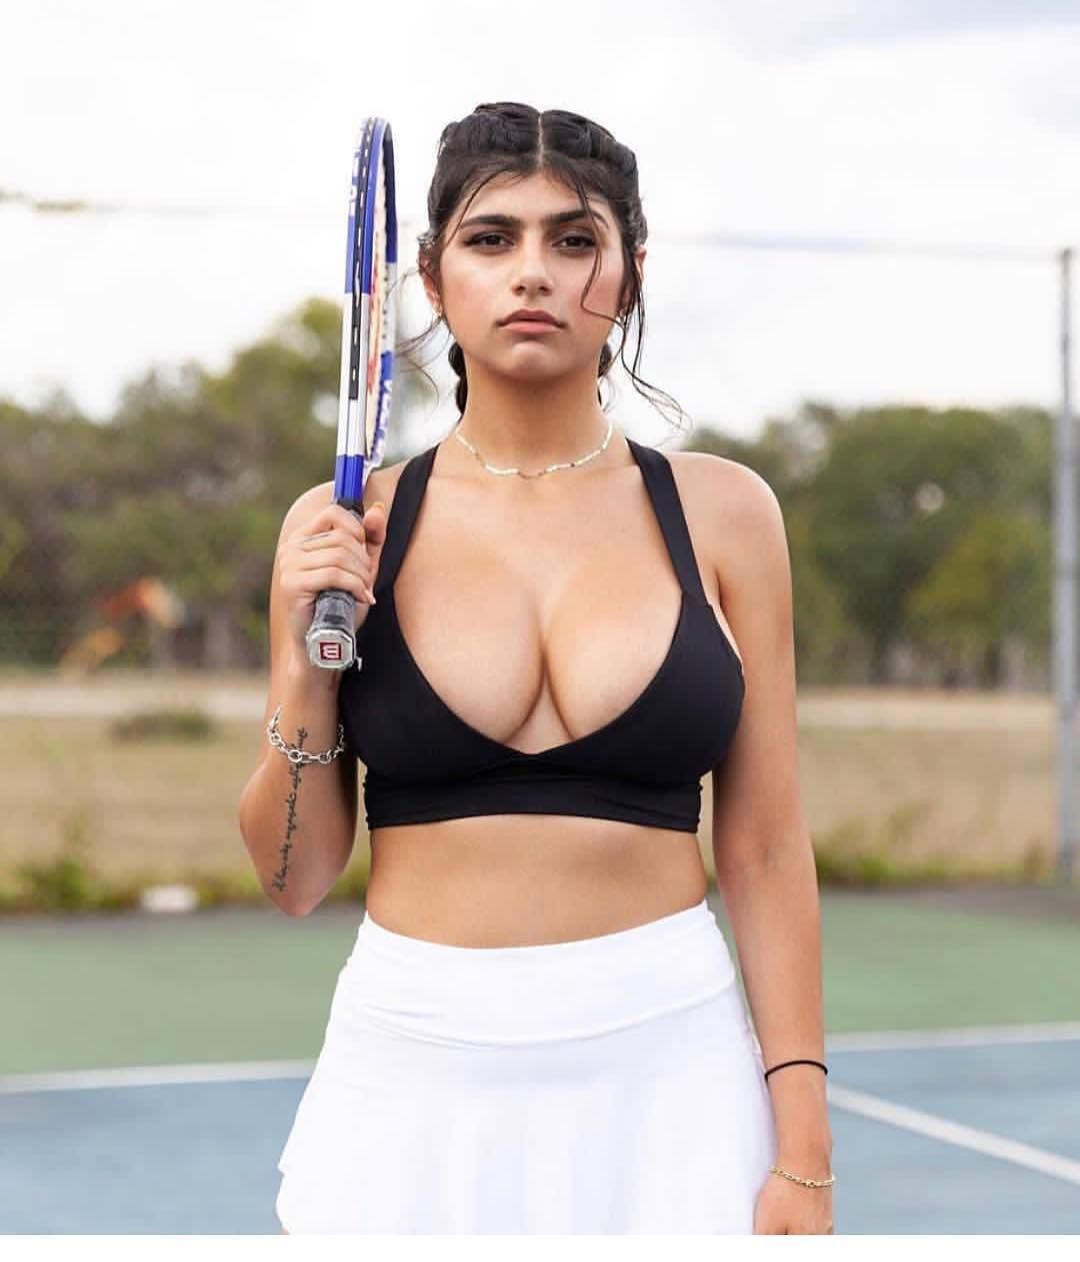 Youtube Laetitia Casta nude photos 2019